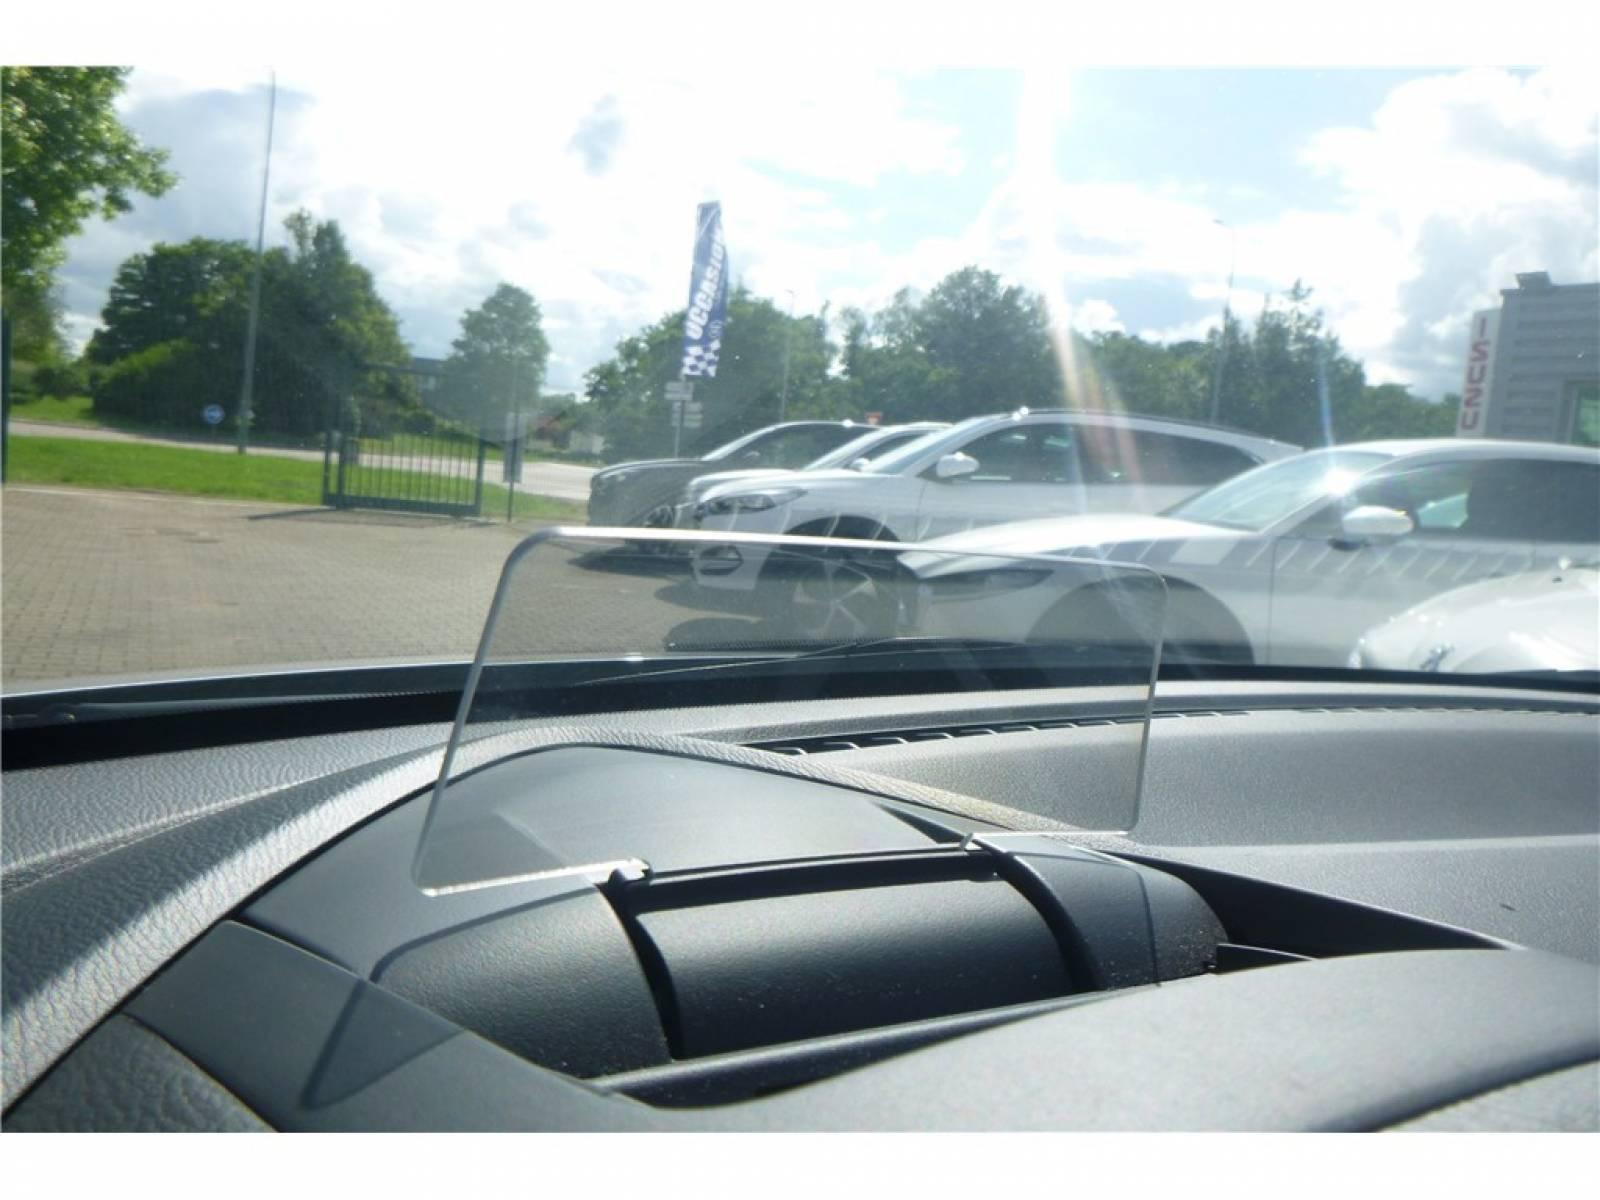 MAZDA Mazda2 1.5L SKYACTIV-G 90ch - véhicule d'occasion - Groupe Guillet - Chalon Automobiles - 71100 - Chalon-sur-Saône - 14